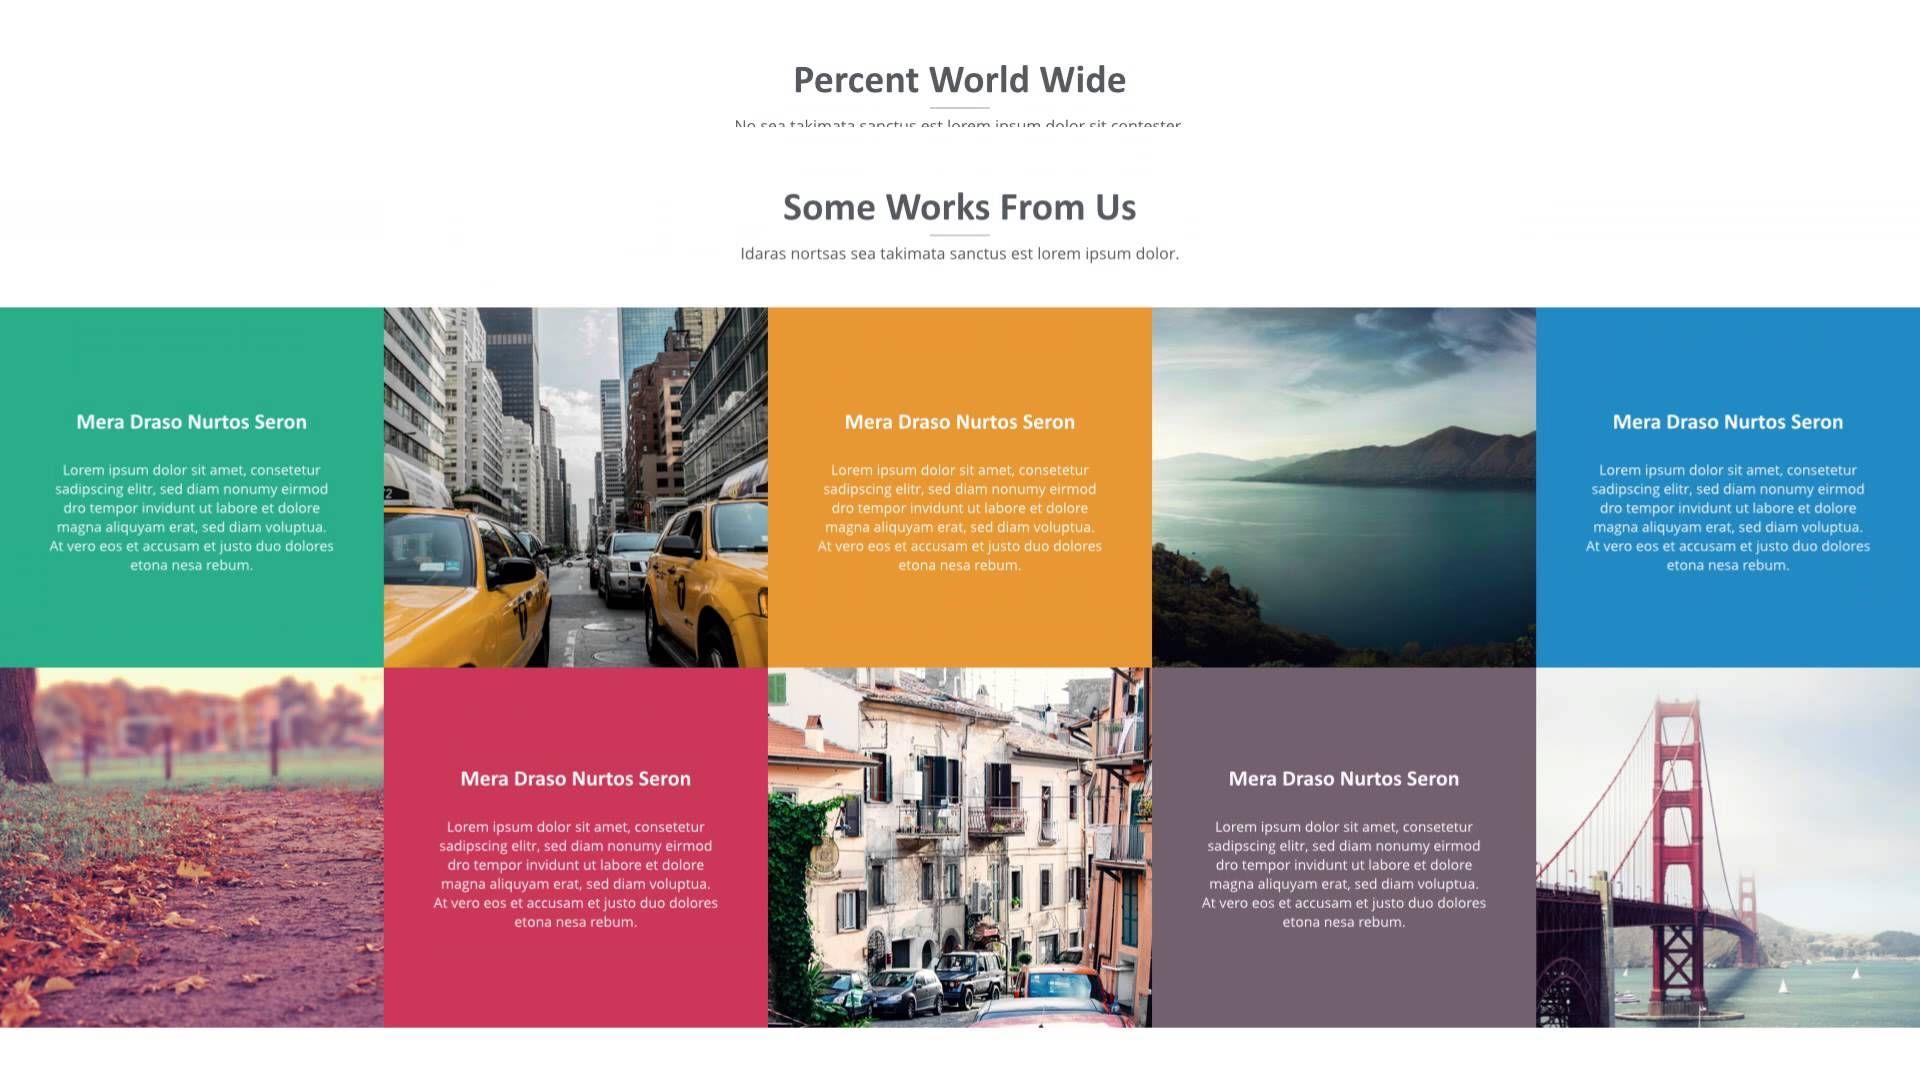 Travel Agency PowerPoint PPT Presentations - powershow.com